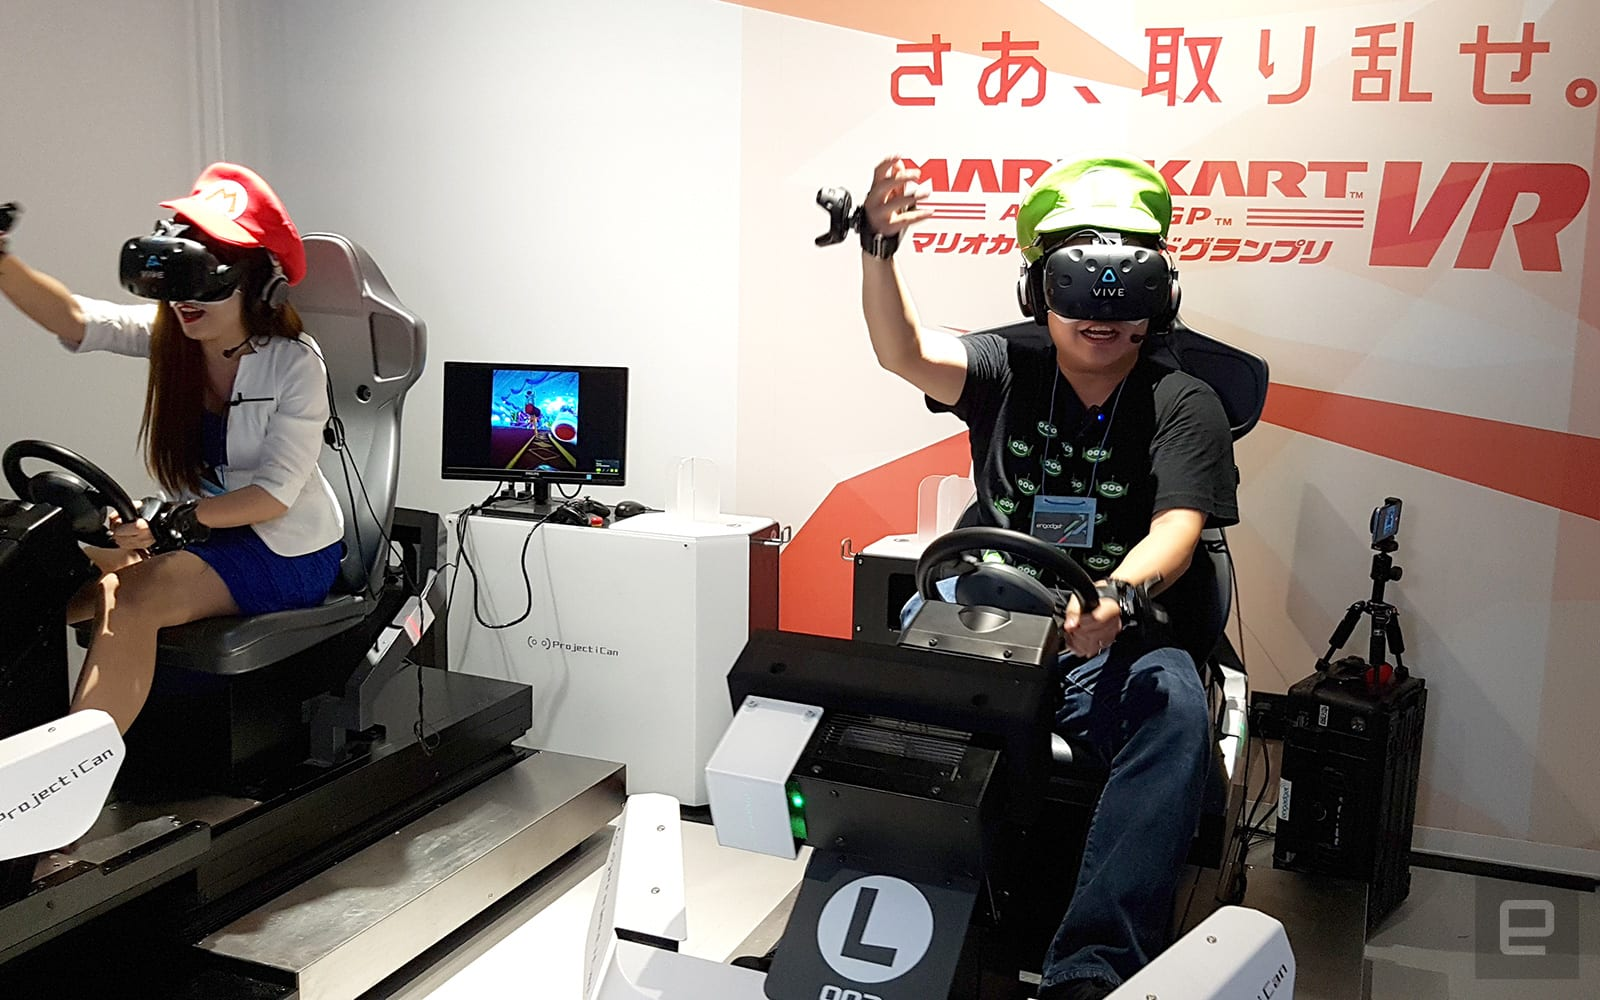 Mario Kart VR comes to Southern California